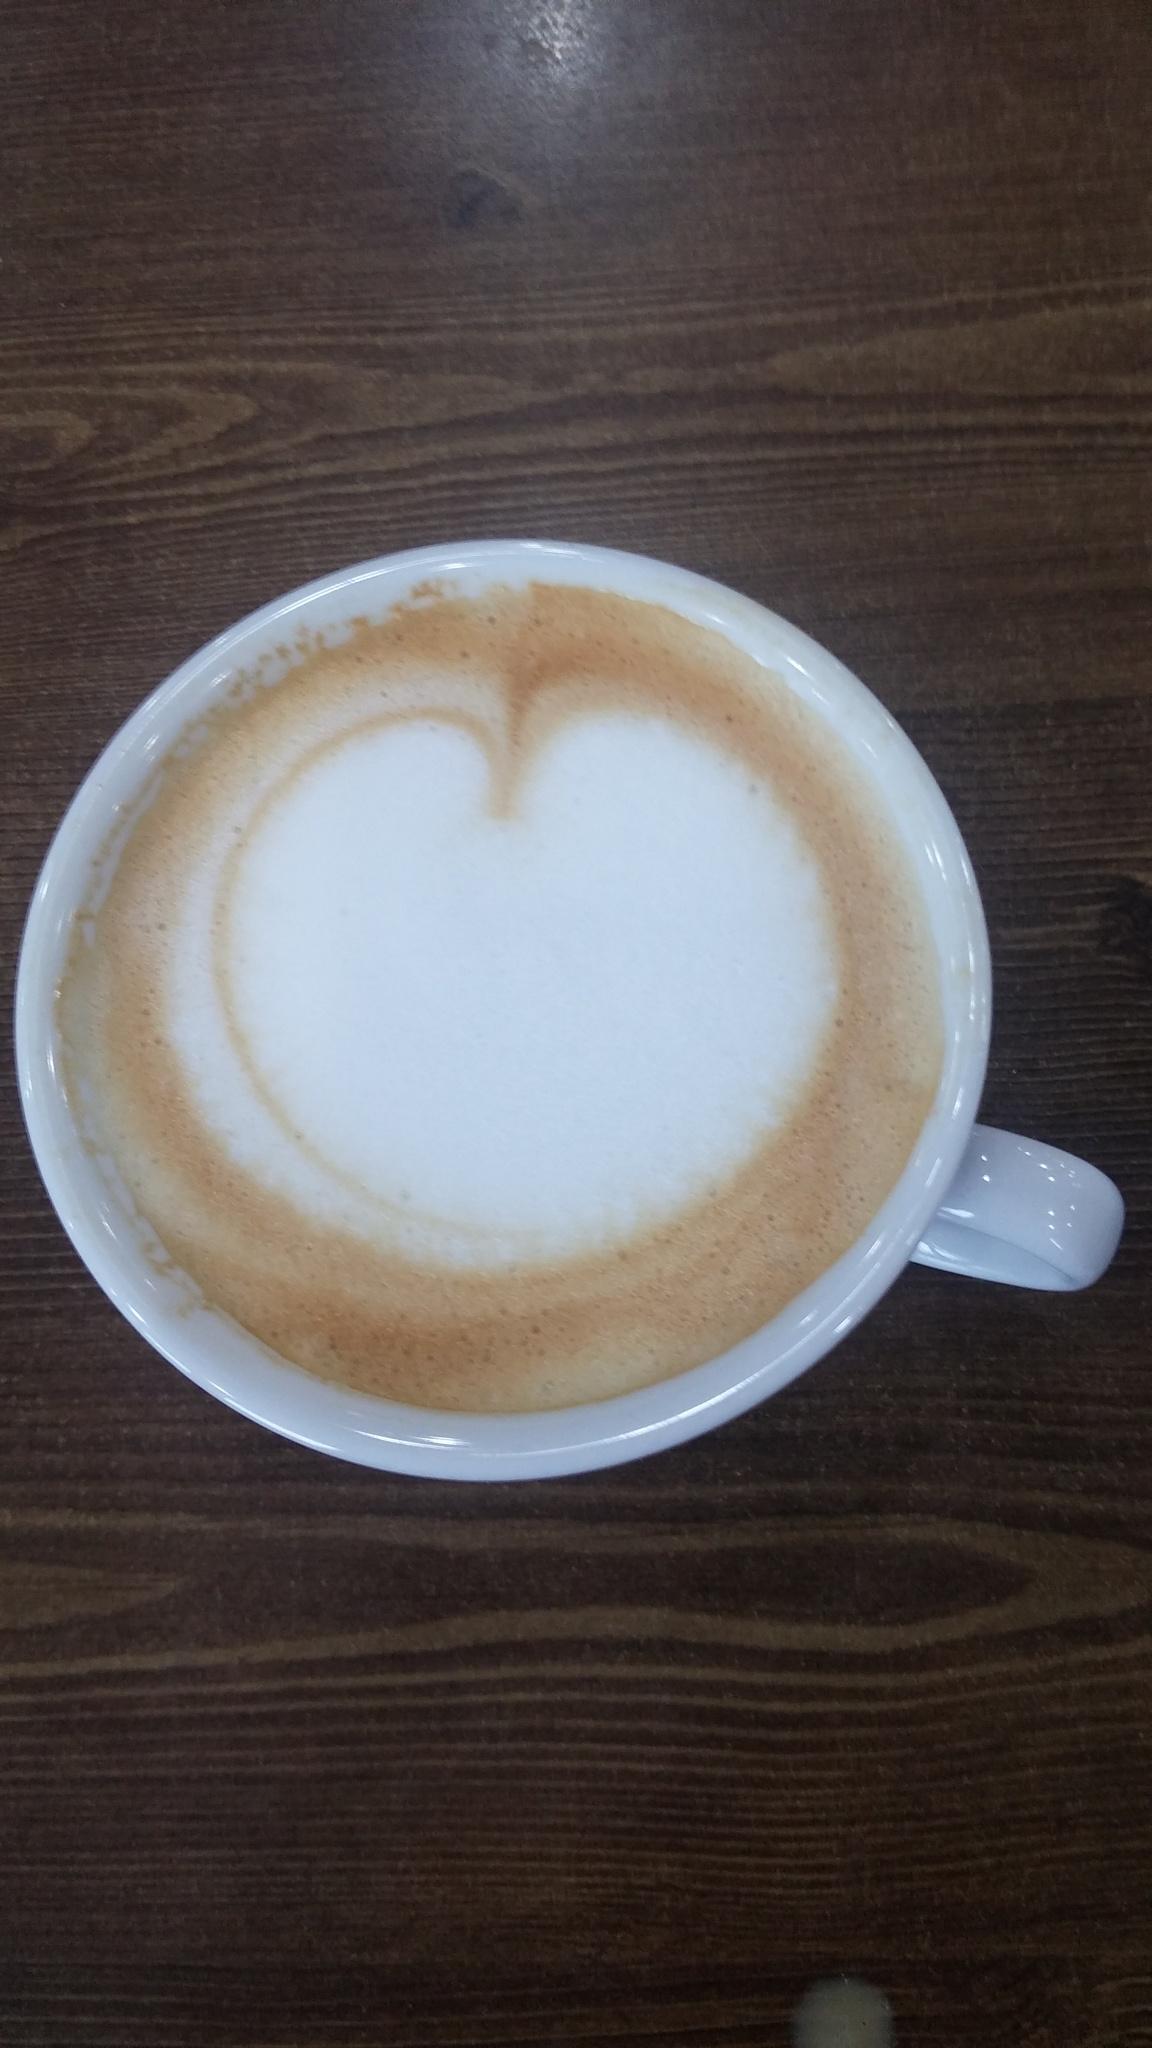 Cappuccino by park seong hyeon